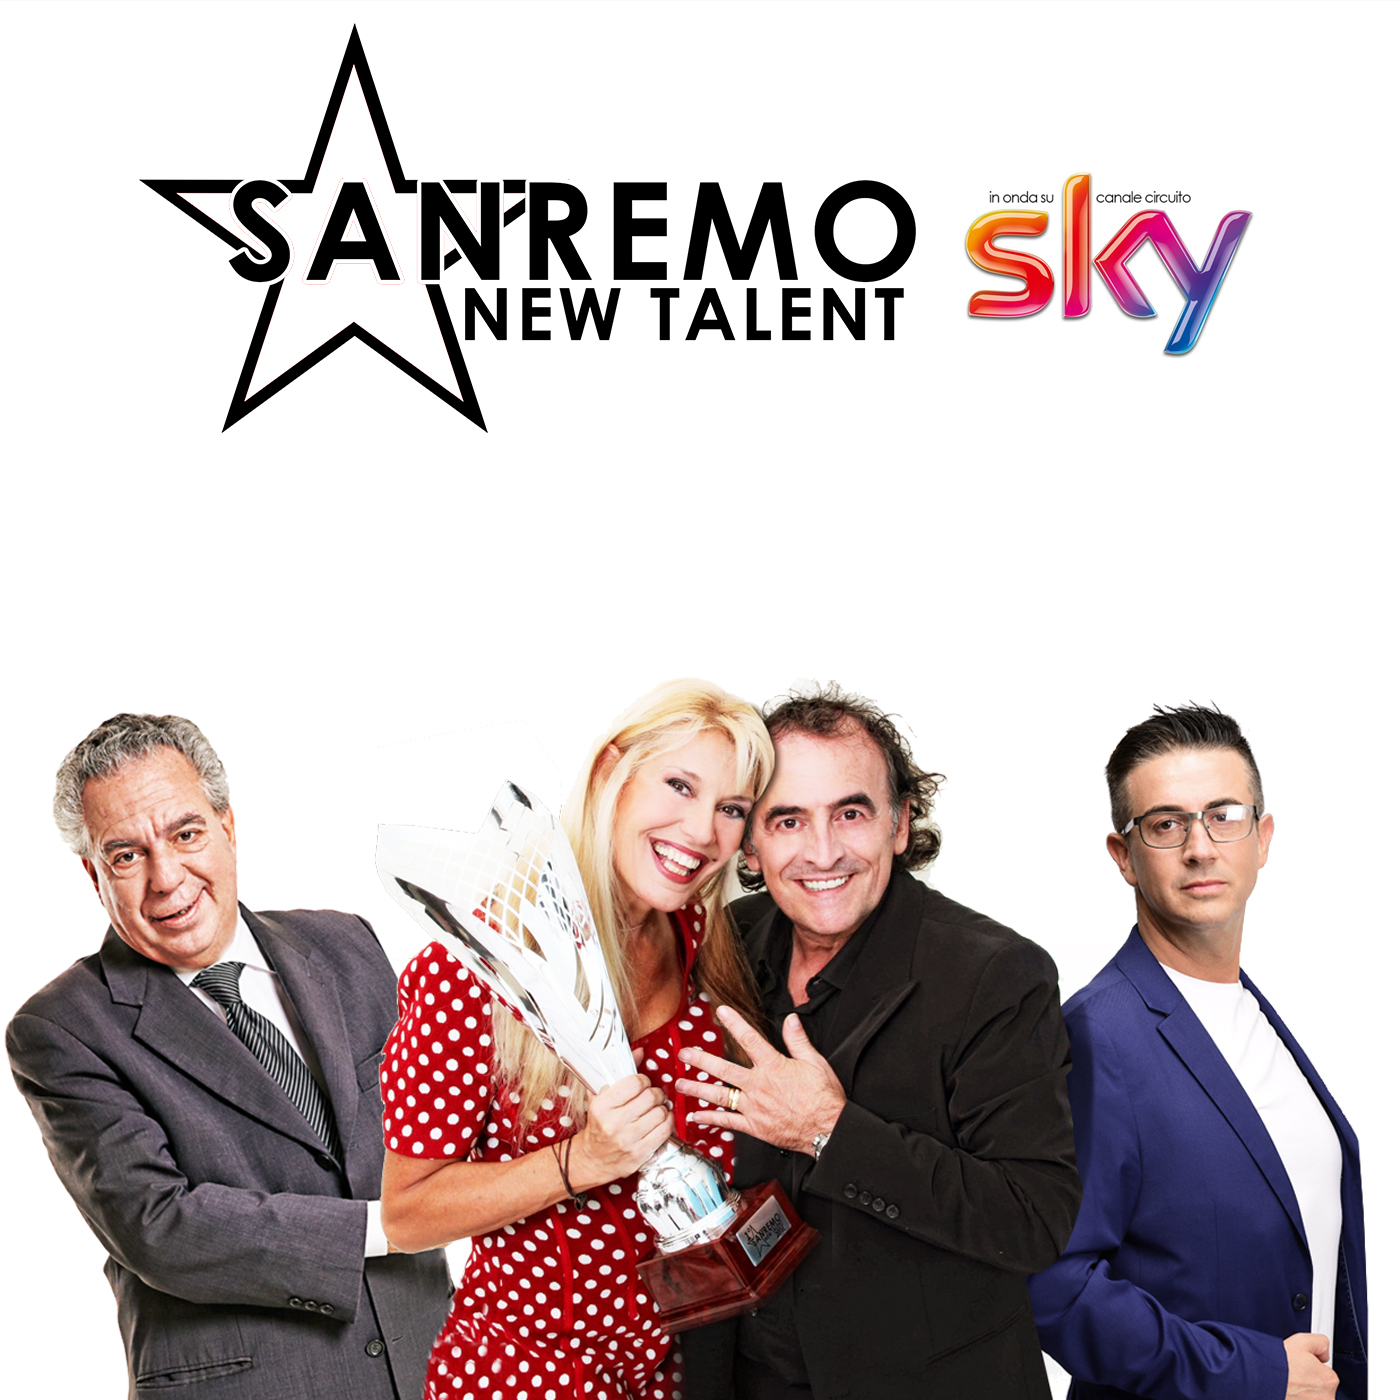 Sanremo Newtalent